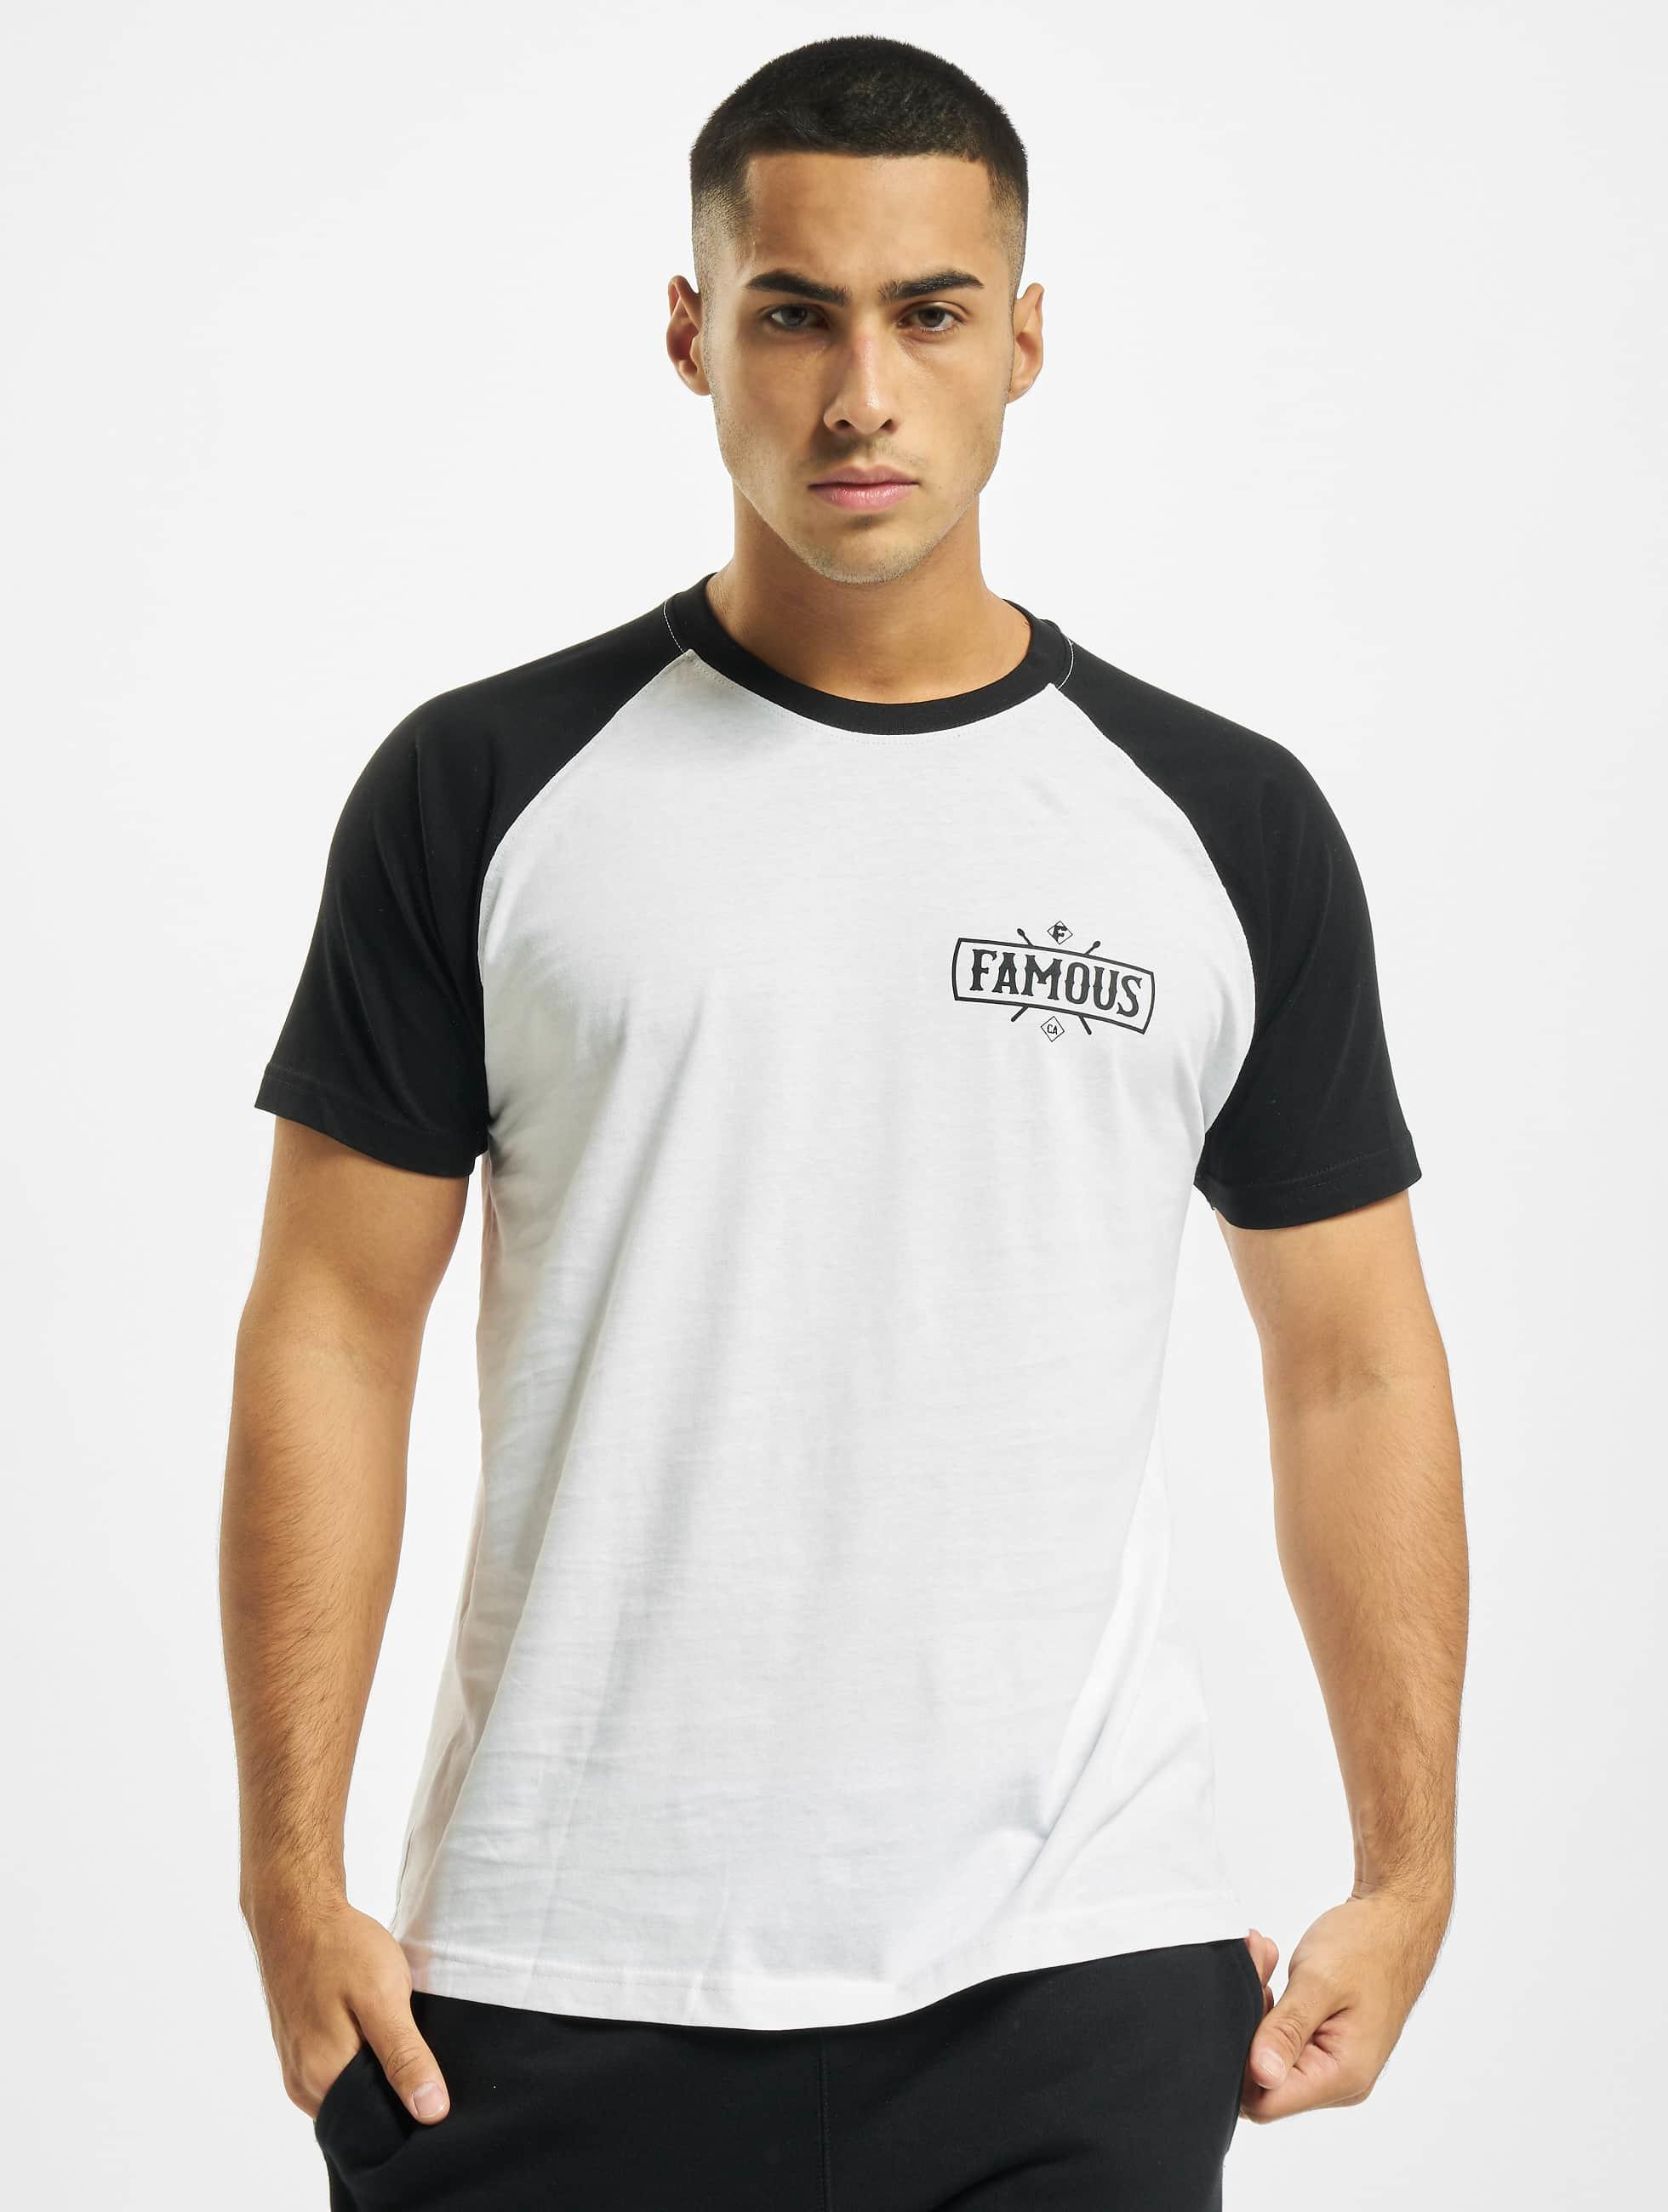 Famous Stars and Straps T-Shirt Chaos Patch Raglan blanc